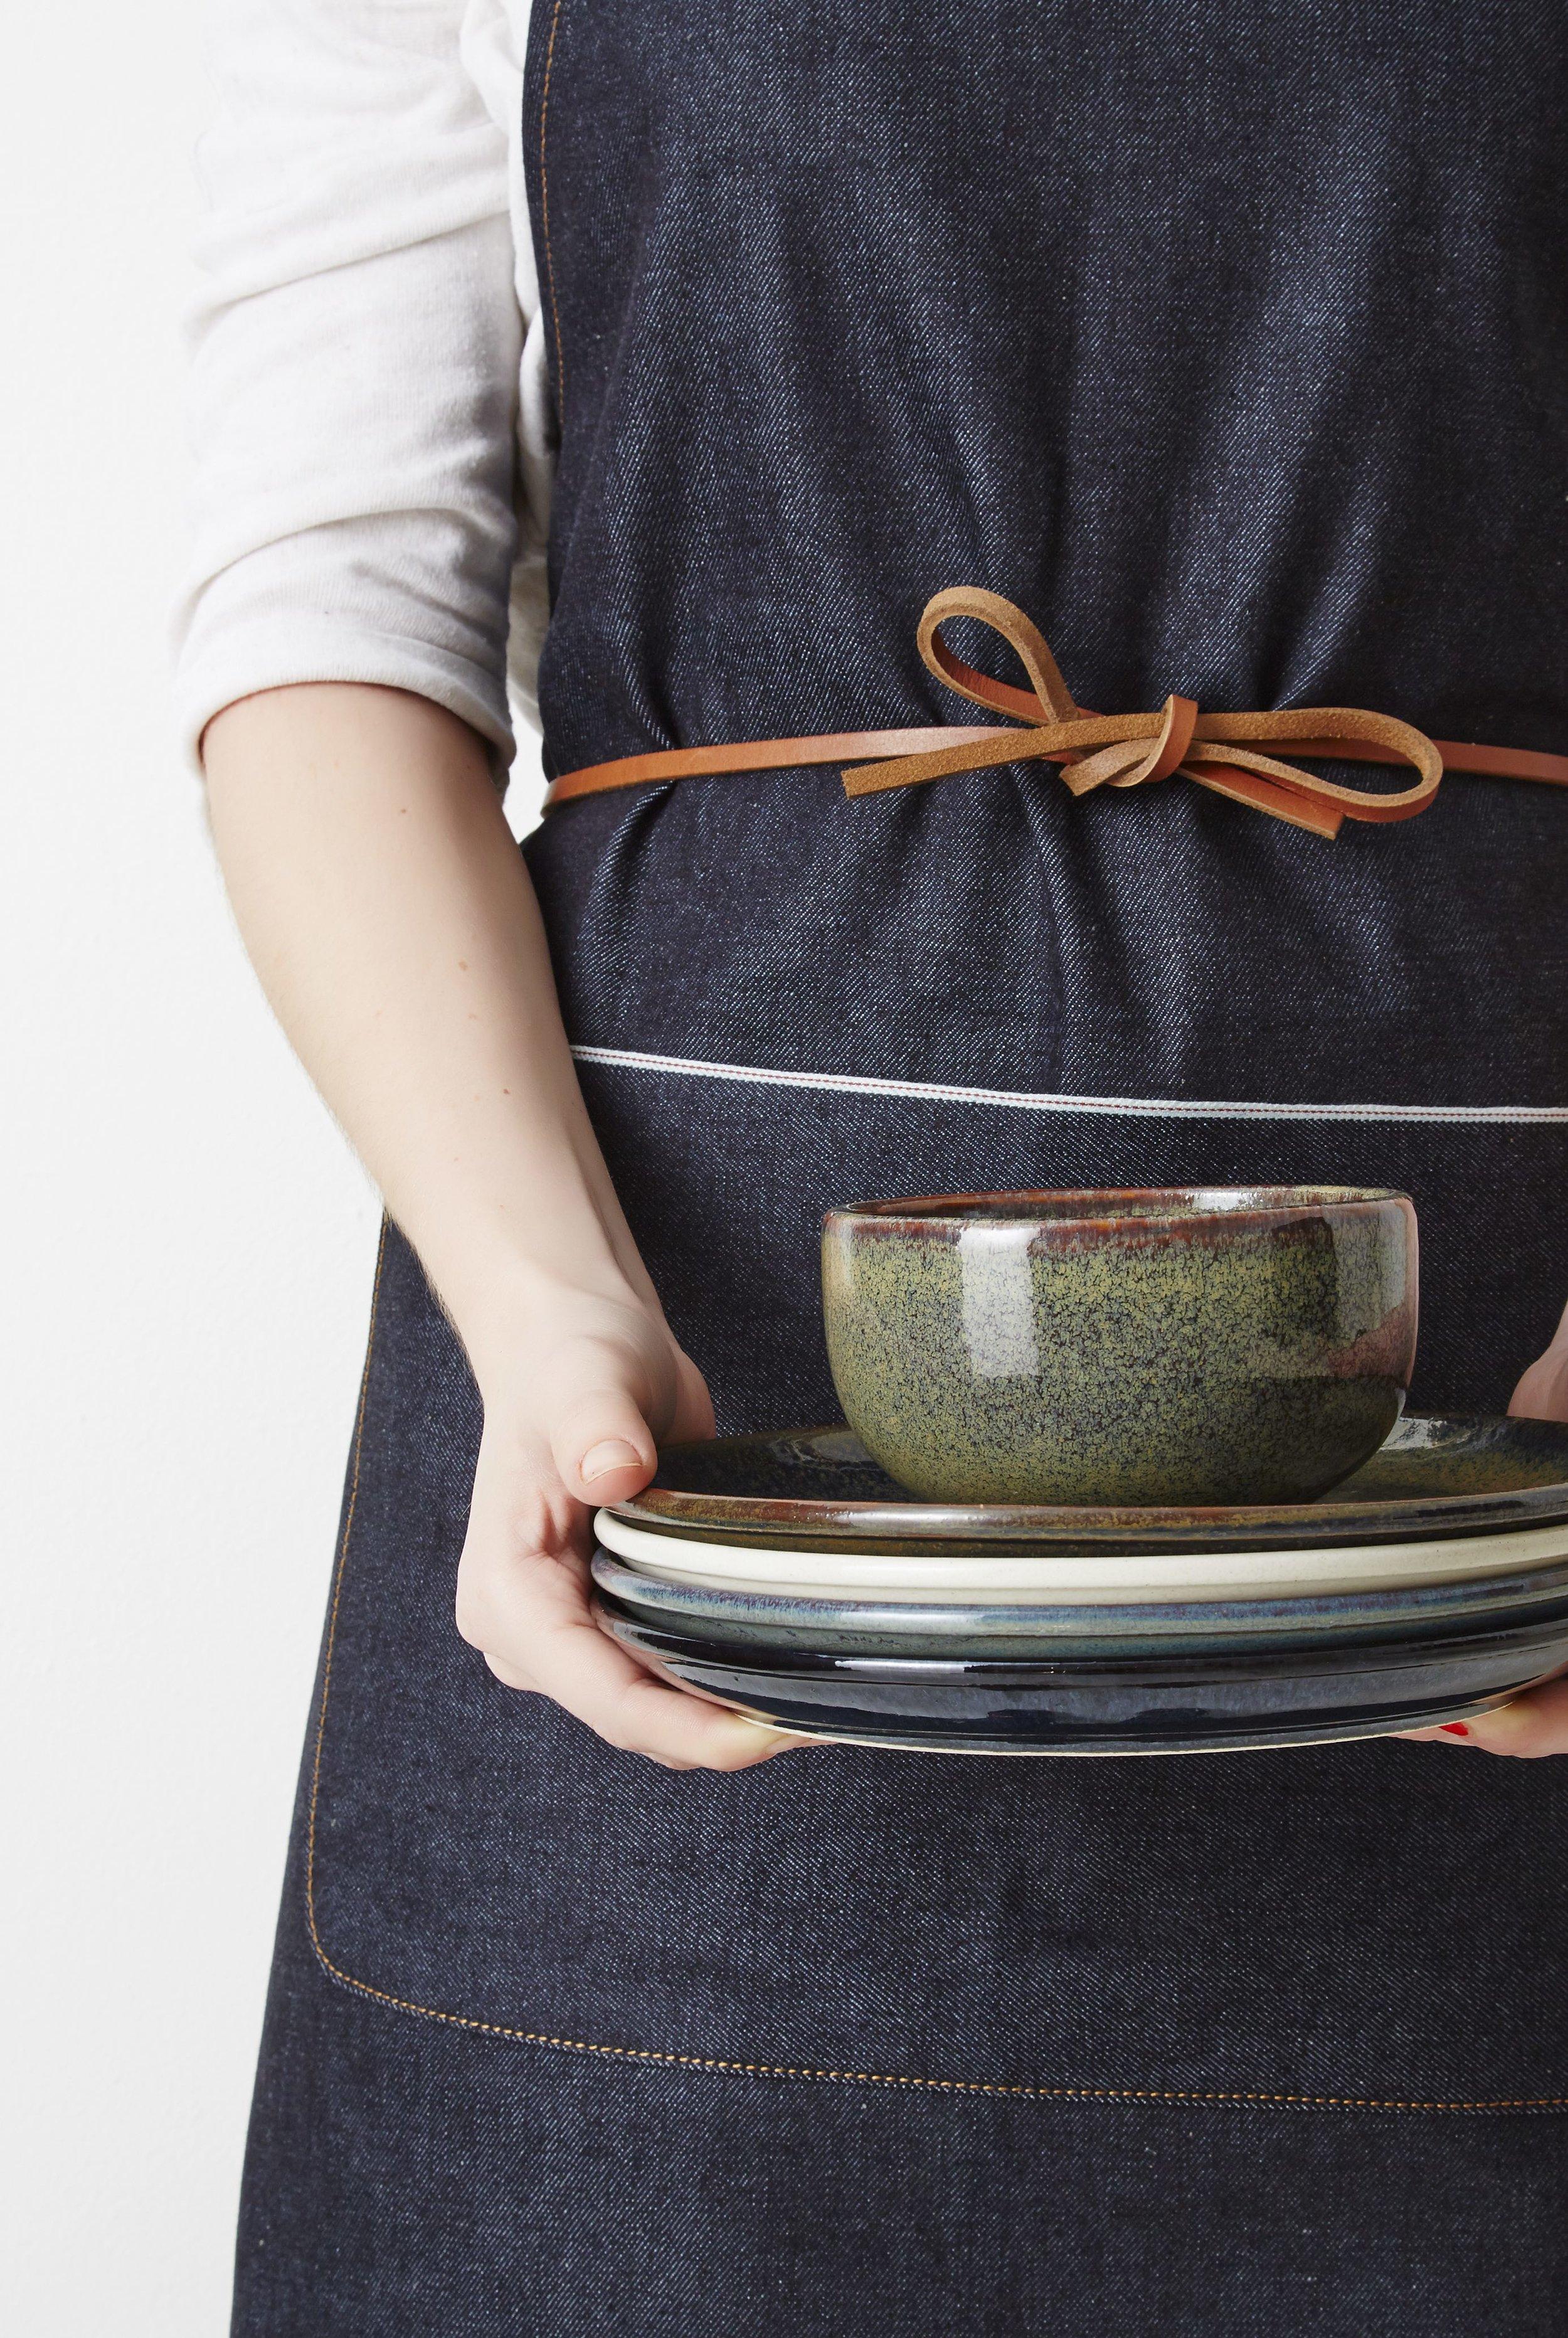 minor-goods-denim-apron-bowls-lifestyle-hr